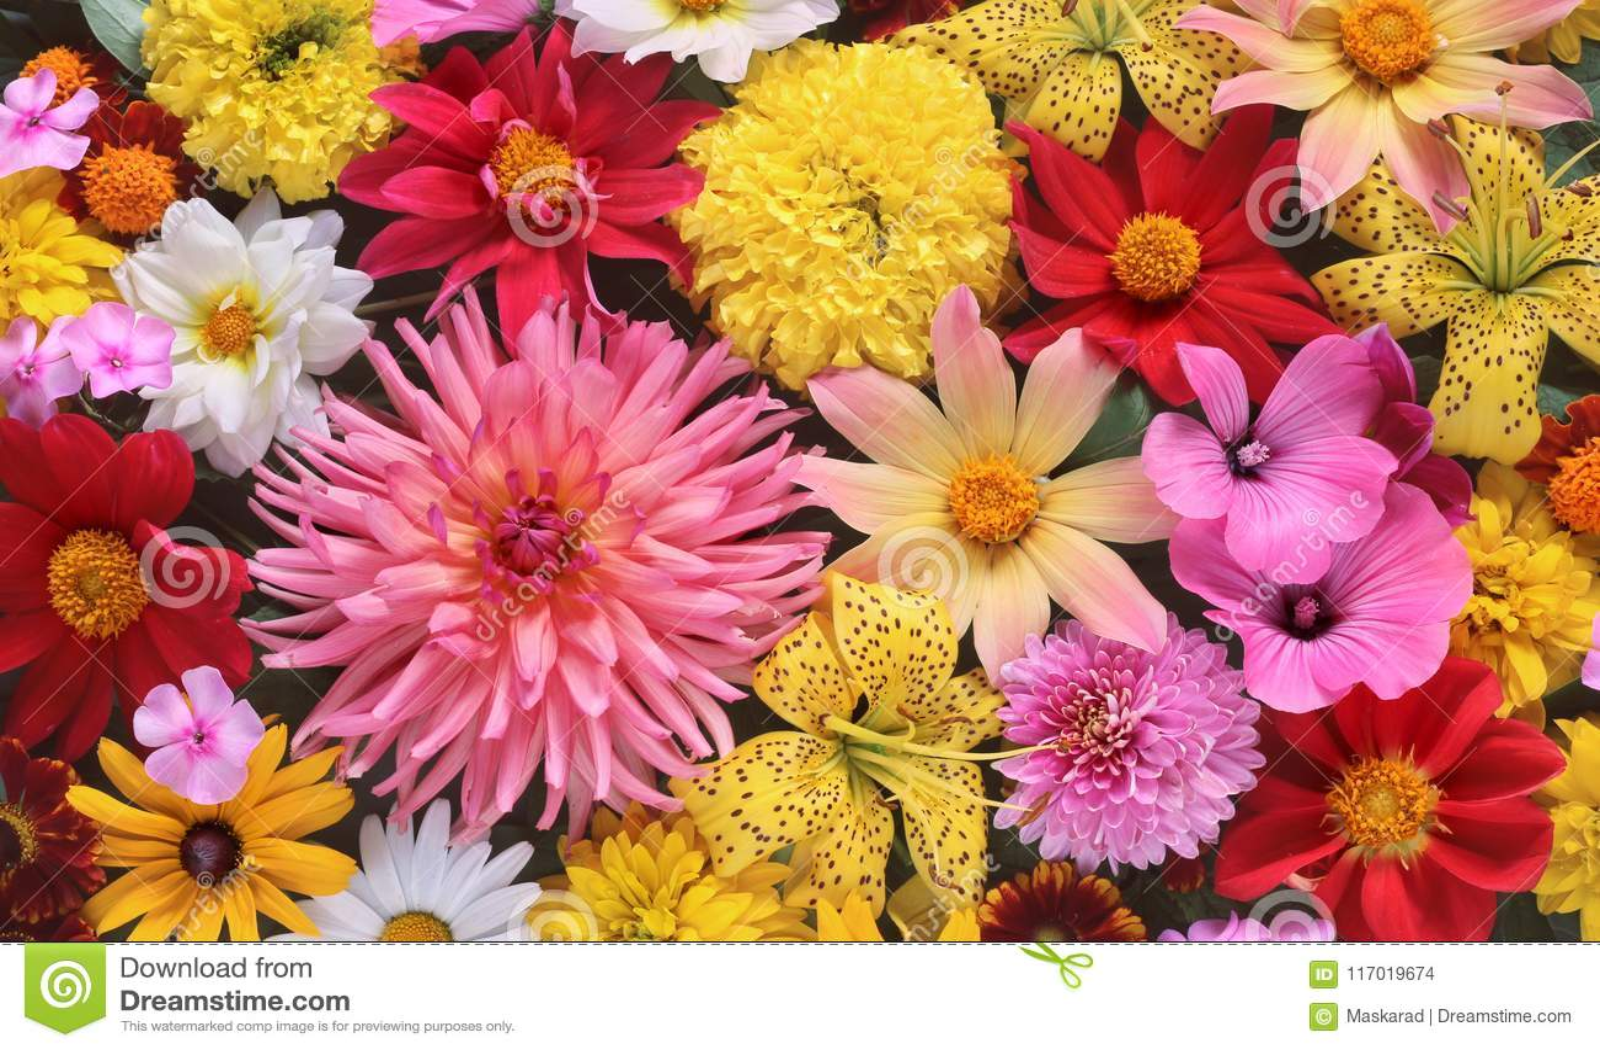 Background Of Summer Garden Flowers, Top View. Stock Photo